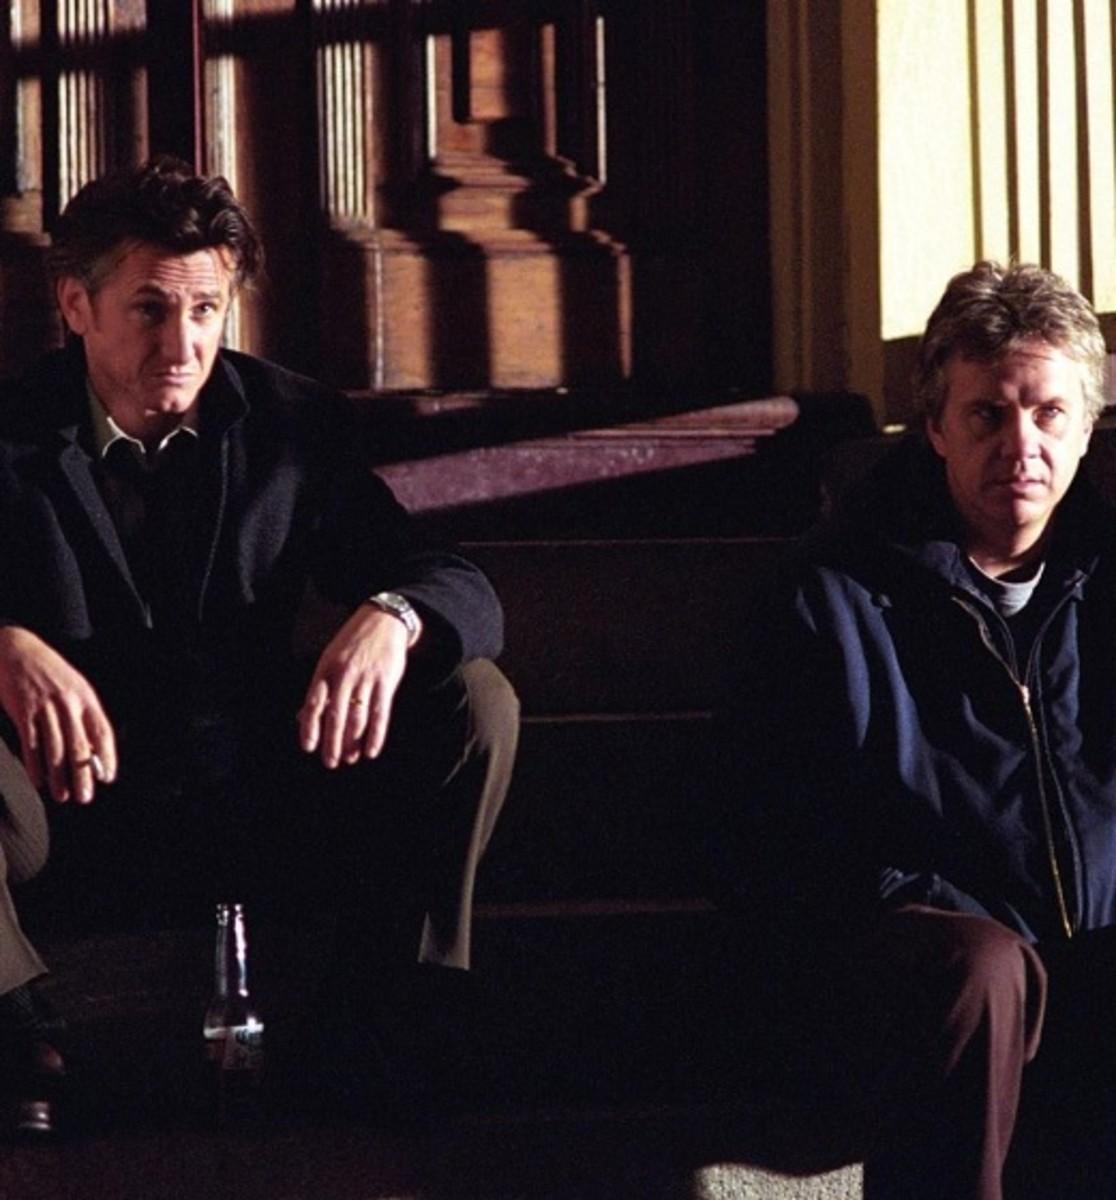 Tim Robbins and Sean Penn in Mystic River (2003)